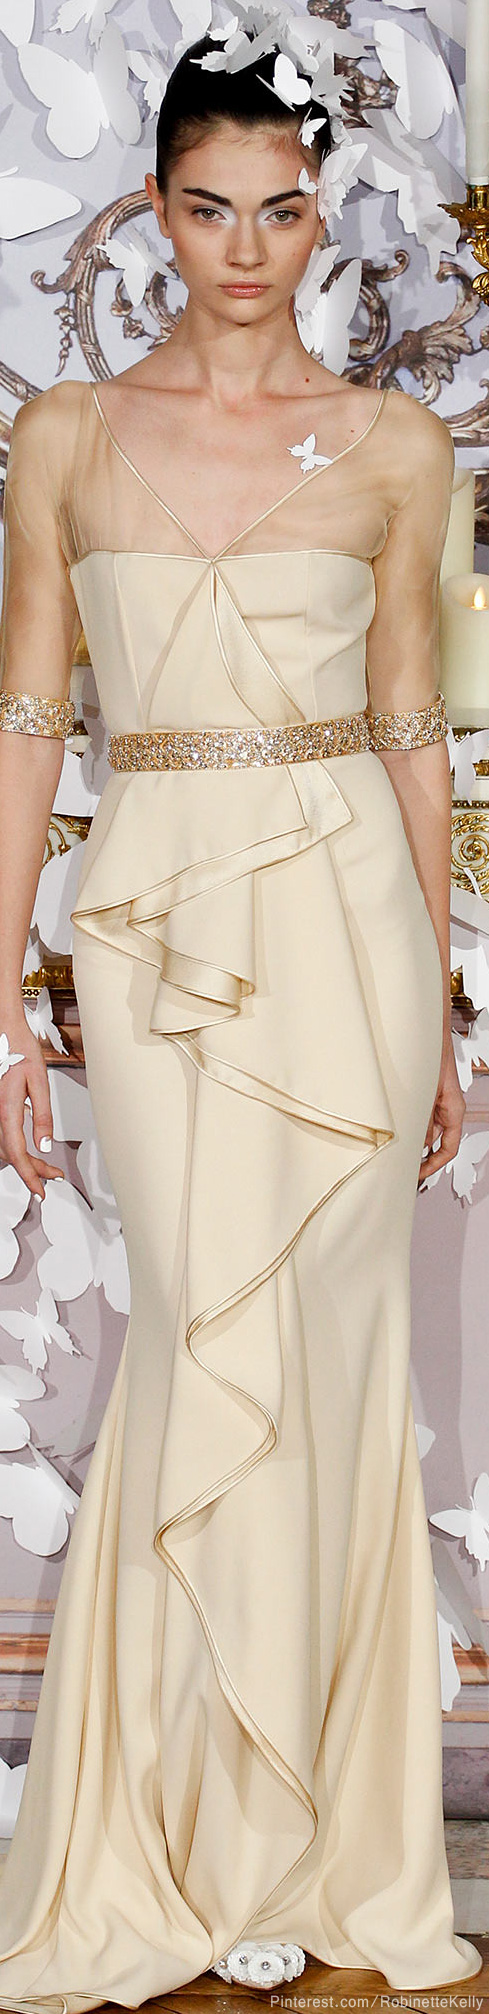 alexis mabille haute couture ss 2014 lange kjoler 2